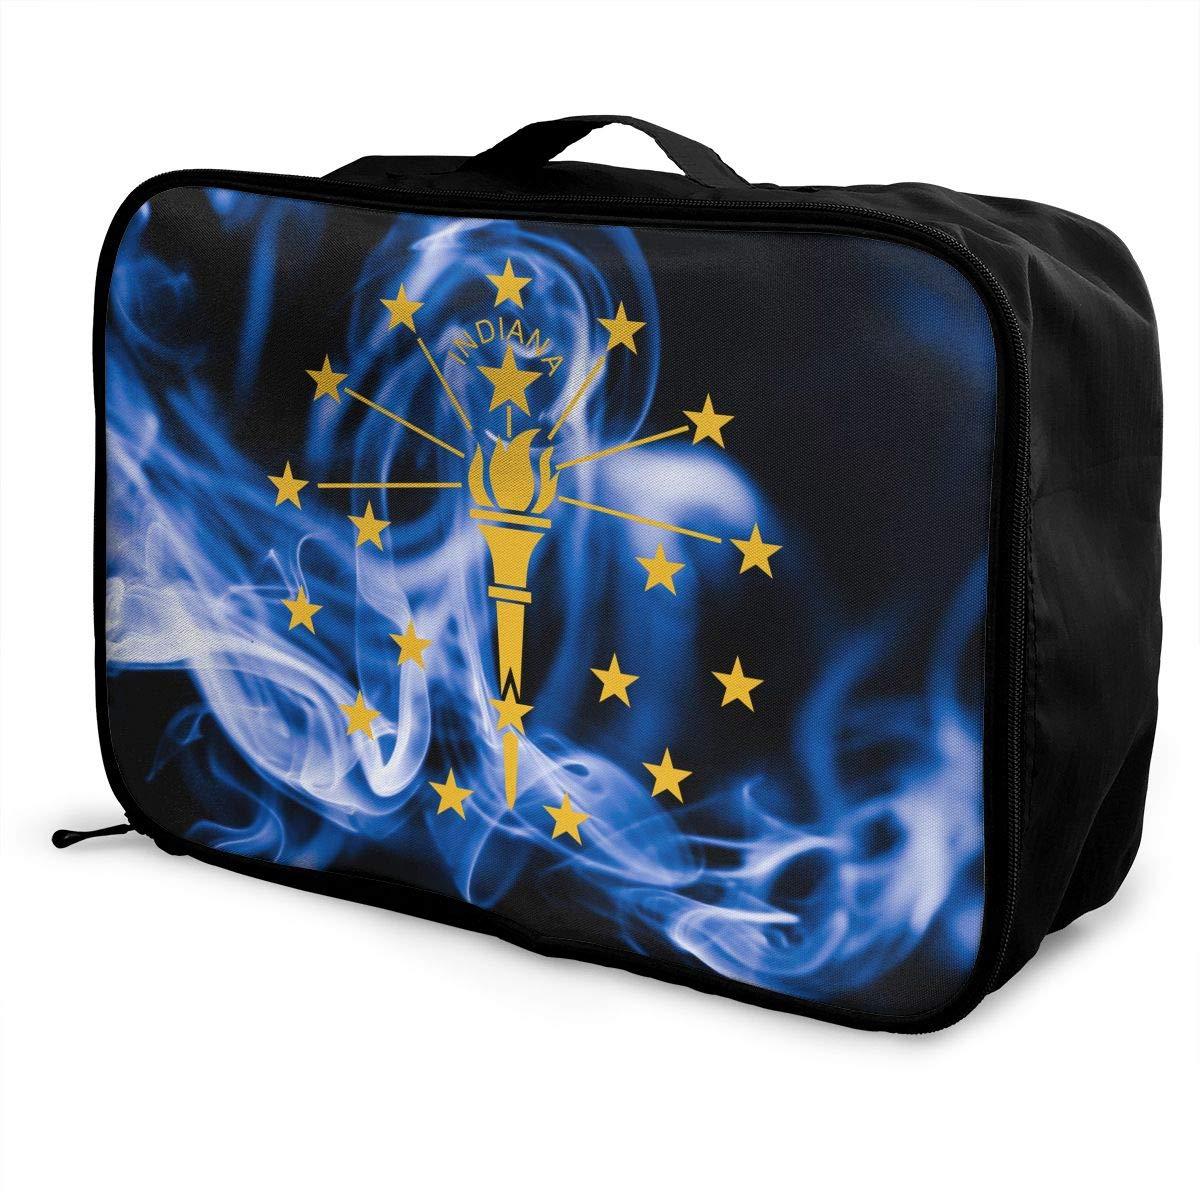 Indiana State Smoke Flag Travel Bag Portable Luggage Bags Duffle Bag Large Capacity Travel Organizer Bag